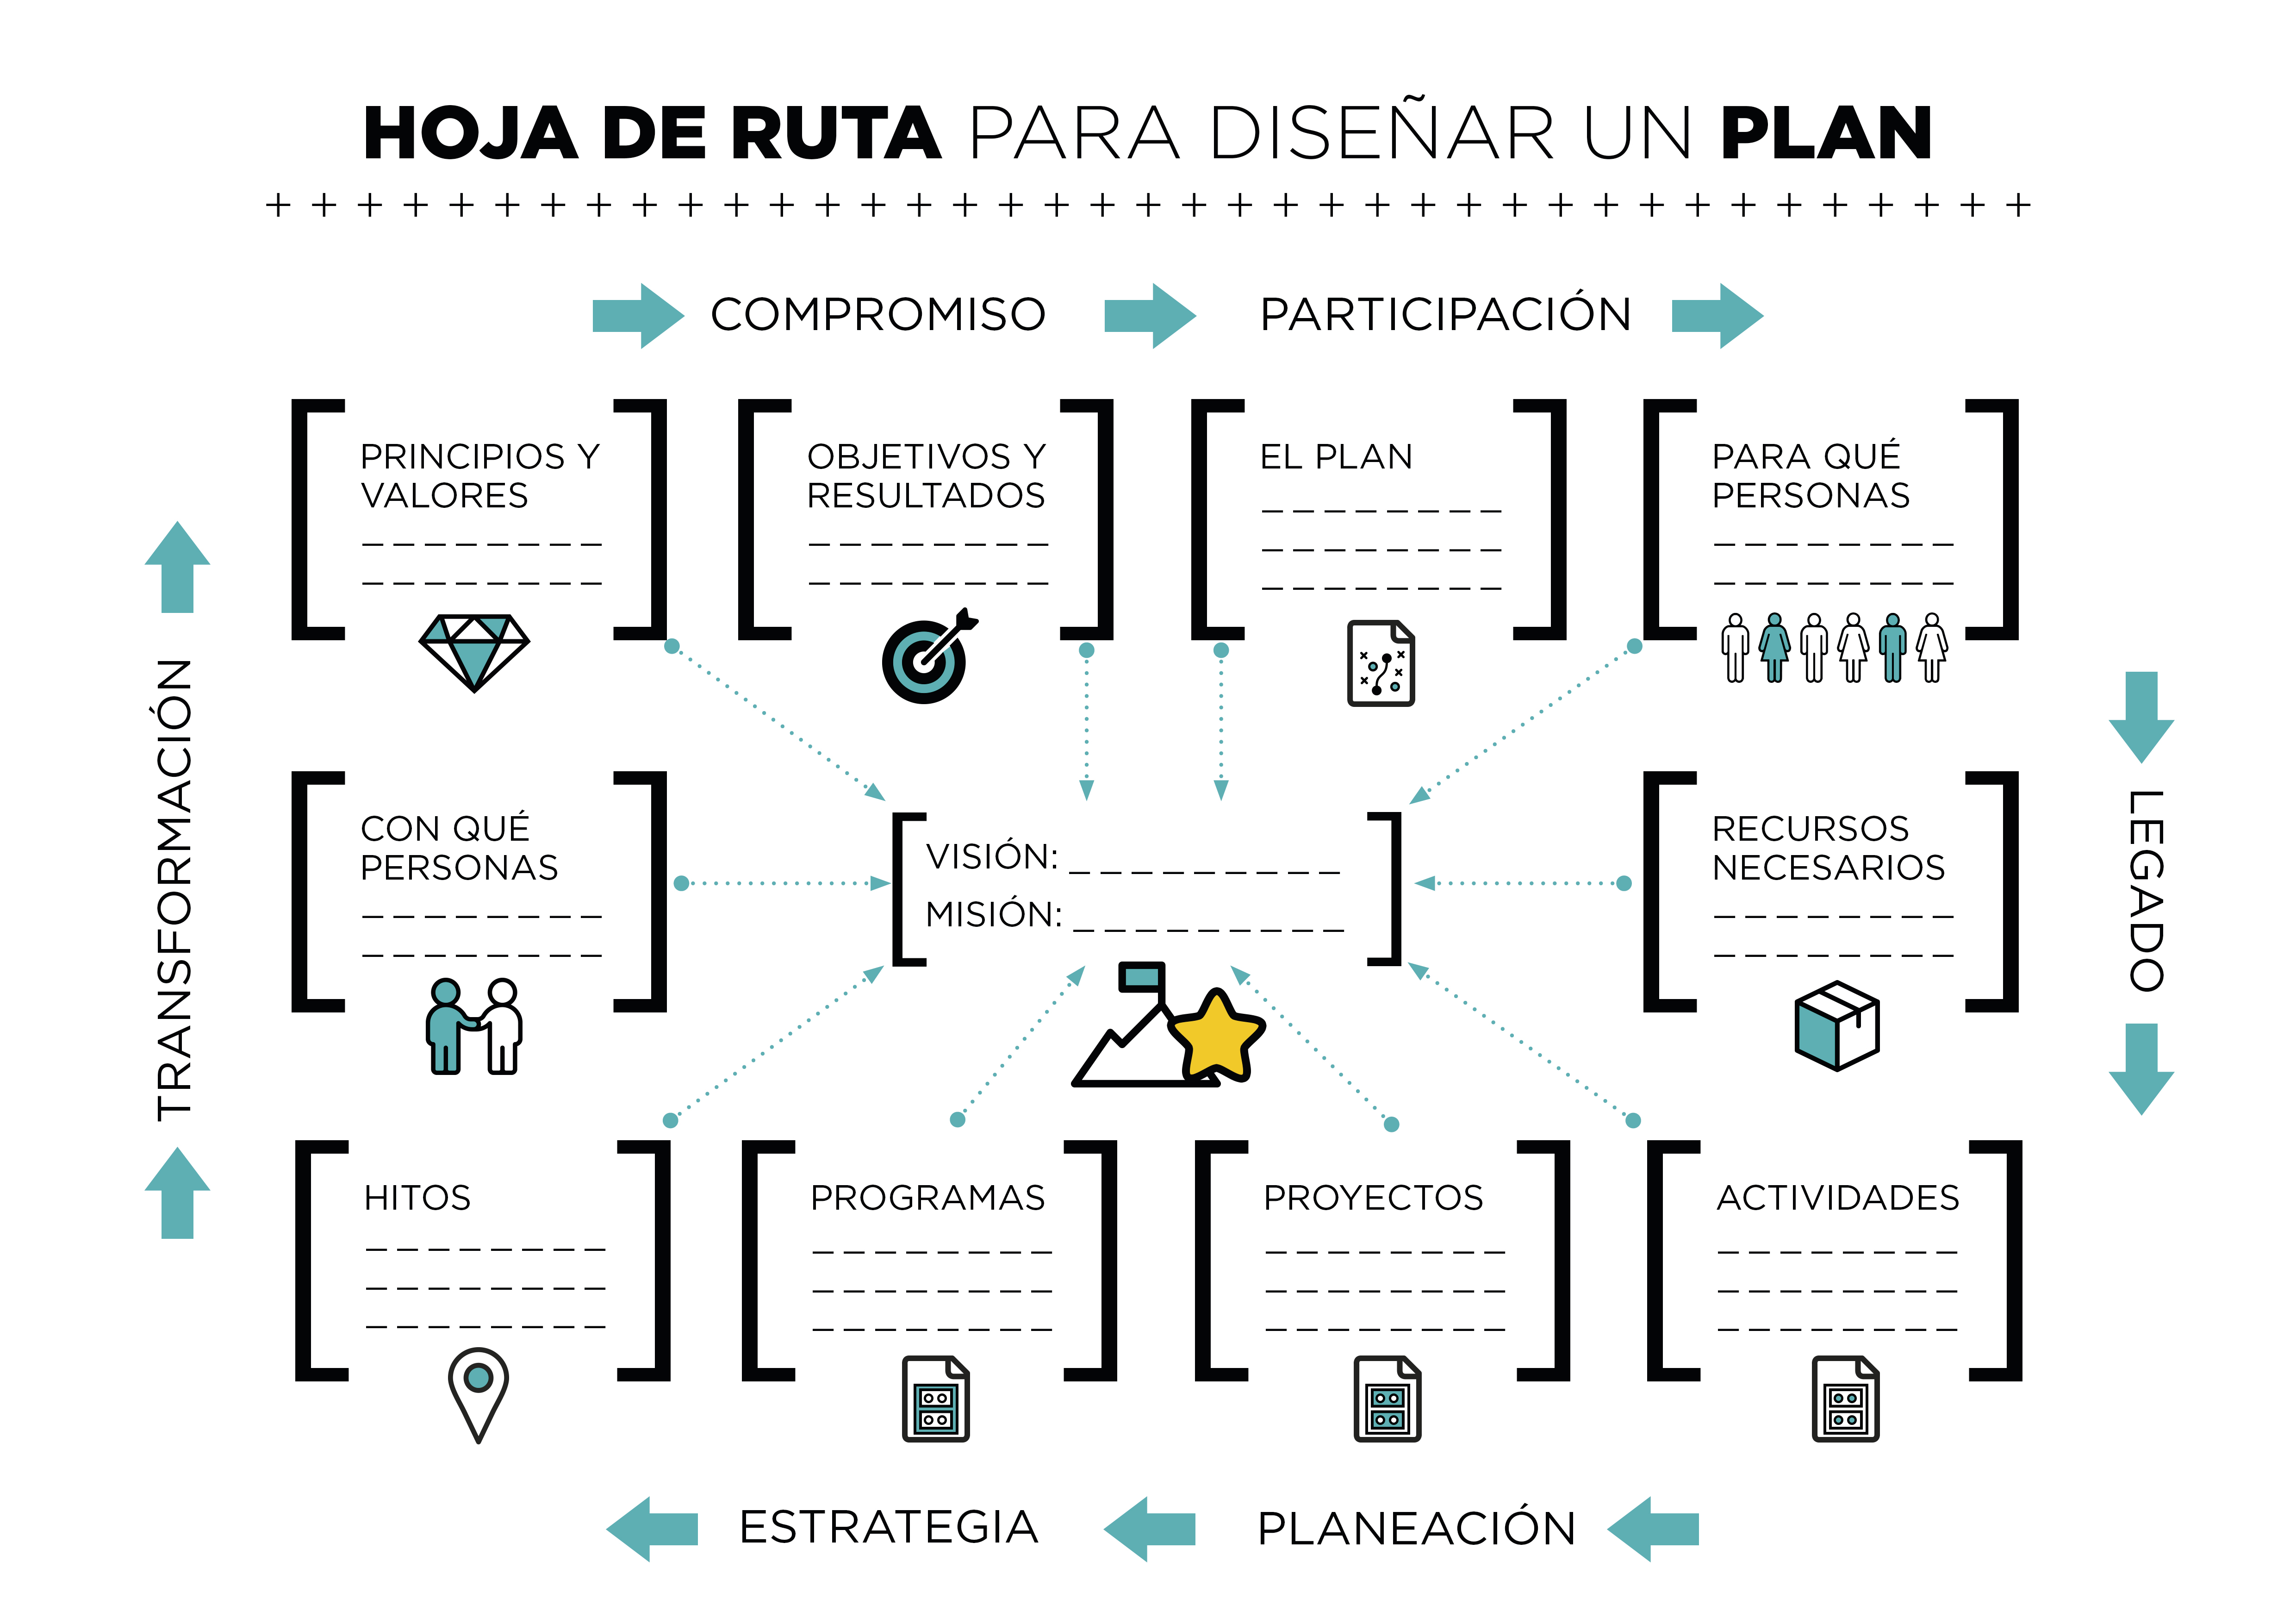 Hoja-ruta-diseñar-plan-completo